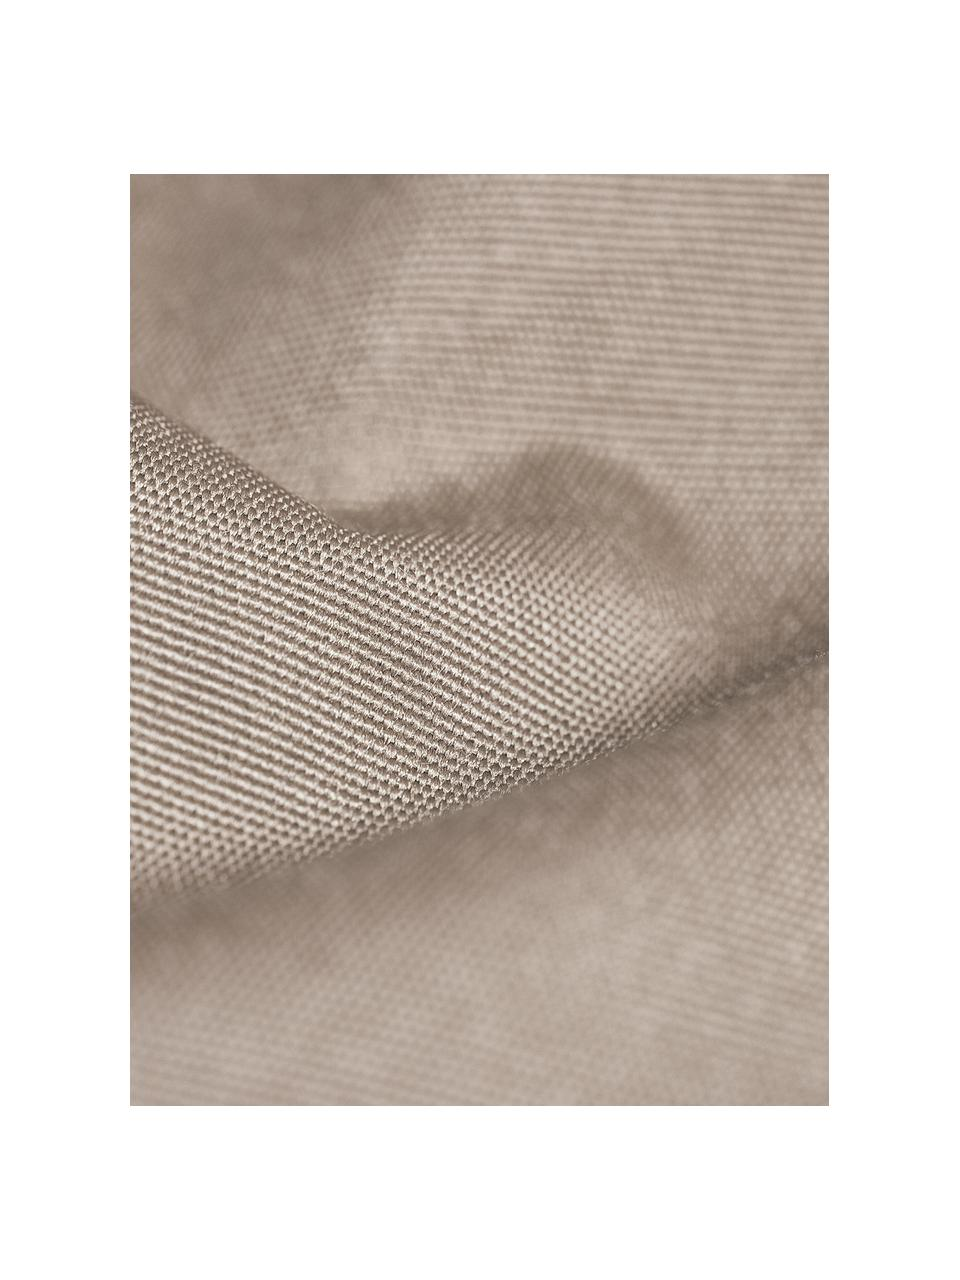 Garten-Liegesack Wave, Bezug: Polyester, polyurethanbes, Schlammgrau, B 70 x T 125 cm